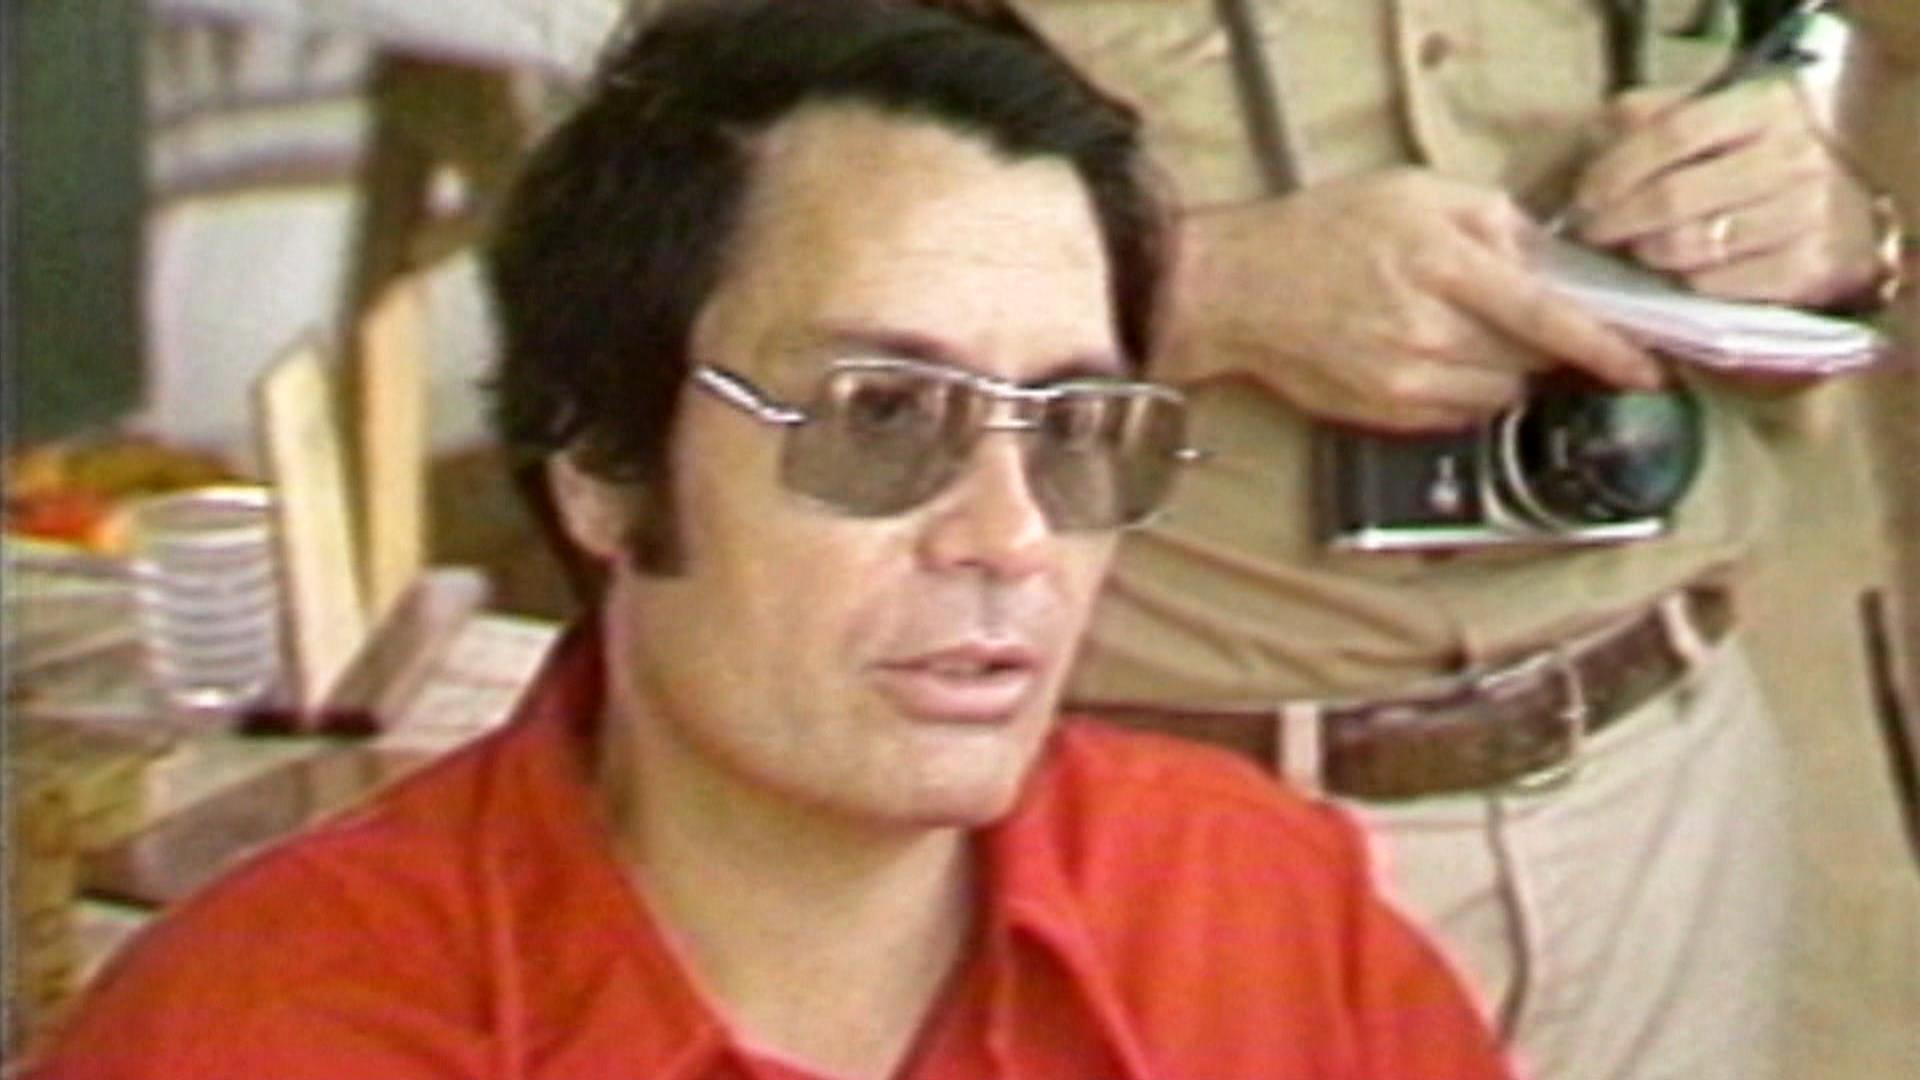 jonestown and jim jones Jonestown cult survivor recalls horrifying massacre in a new a&e documentary jim jones, the leader of the prompting jones to summon his followers.